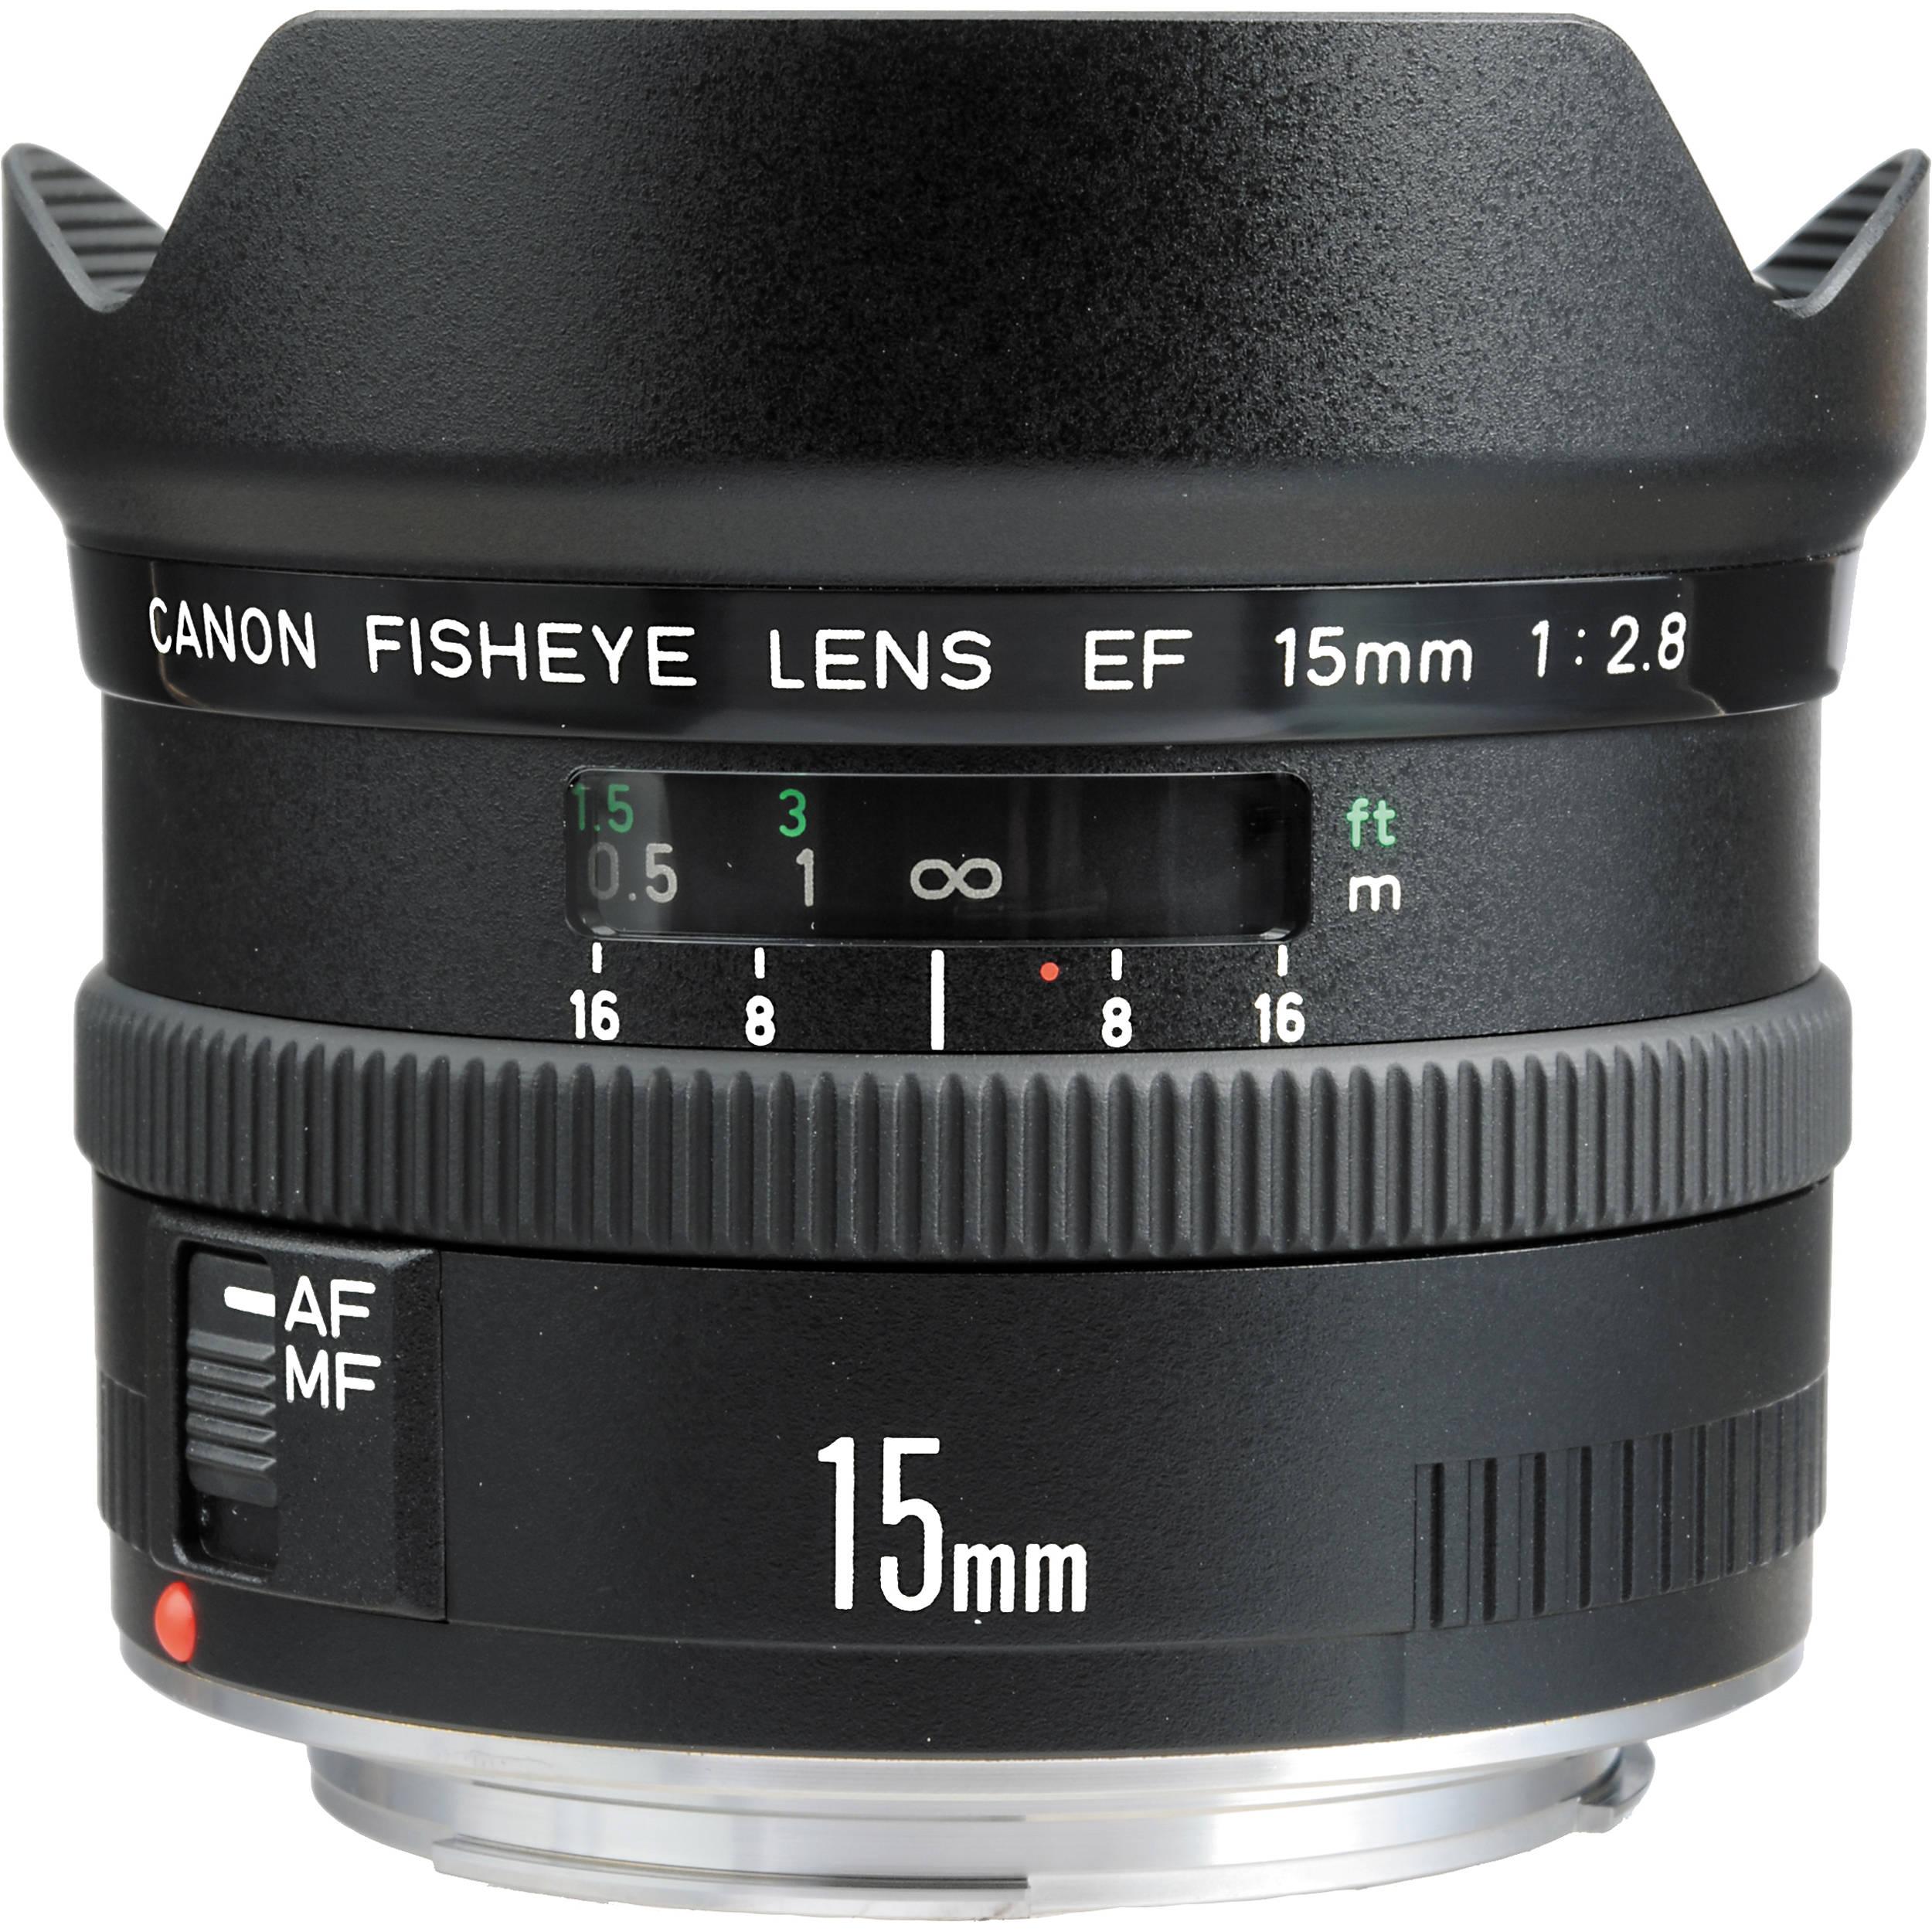 canon fisheye ef 15mm f 2 8 autofocus lens 2535a003 b h photo rh bhphotovideo com Canon Fisheye 15Mm EF 15Mm F 2.8 Fisheye